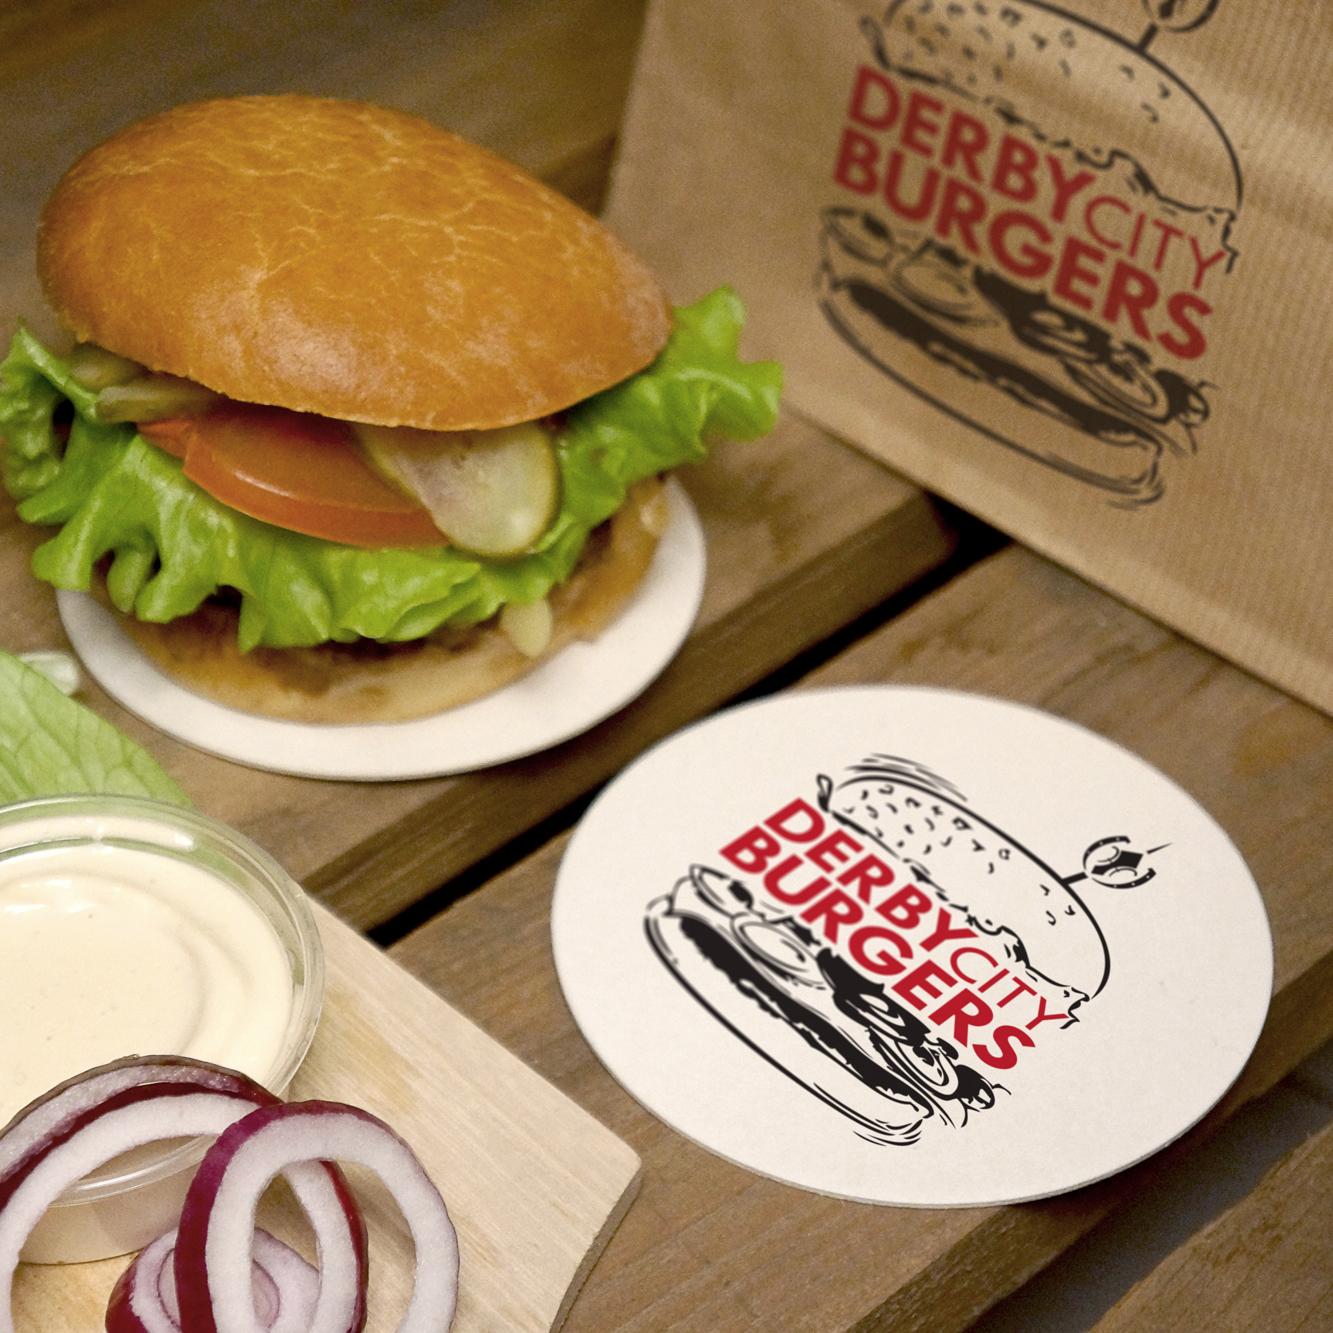 derby-city-burgers-logo-design-bag-coaster.jpg